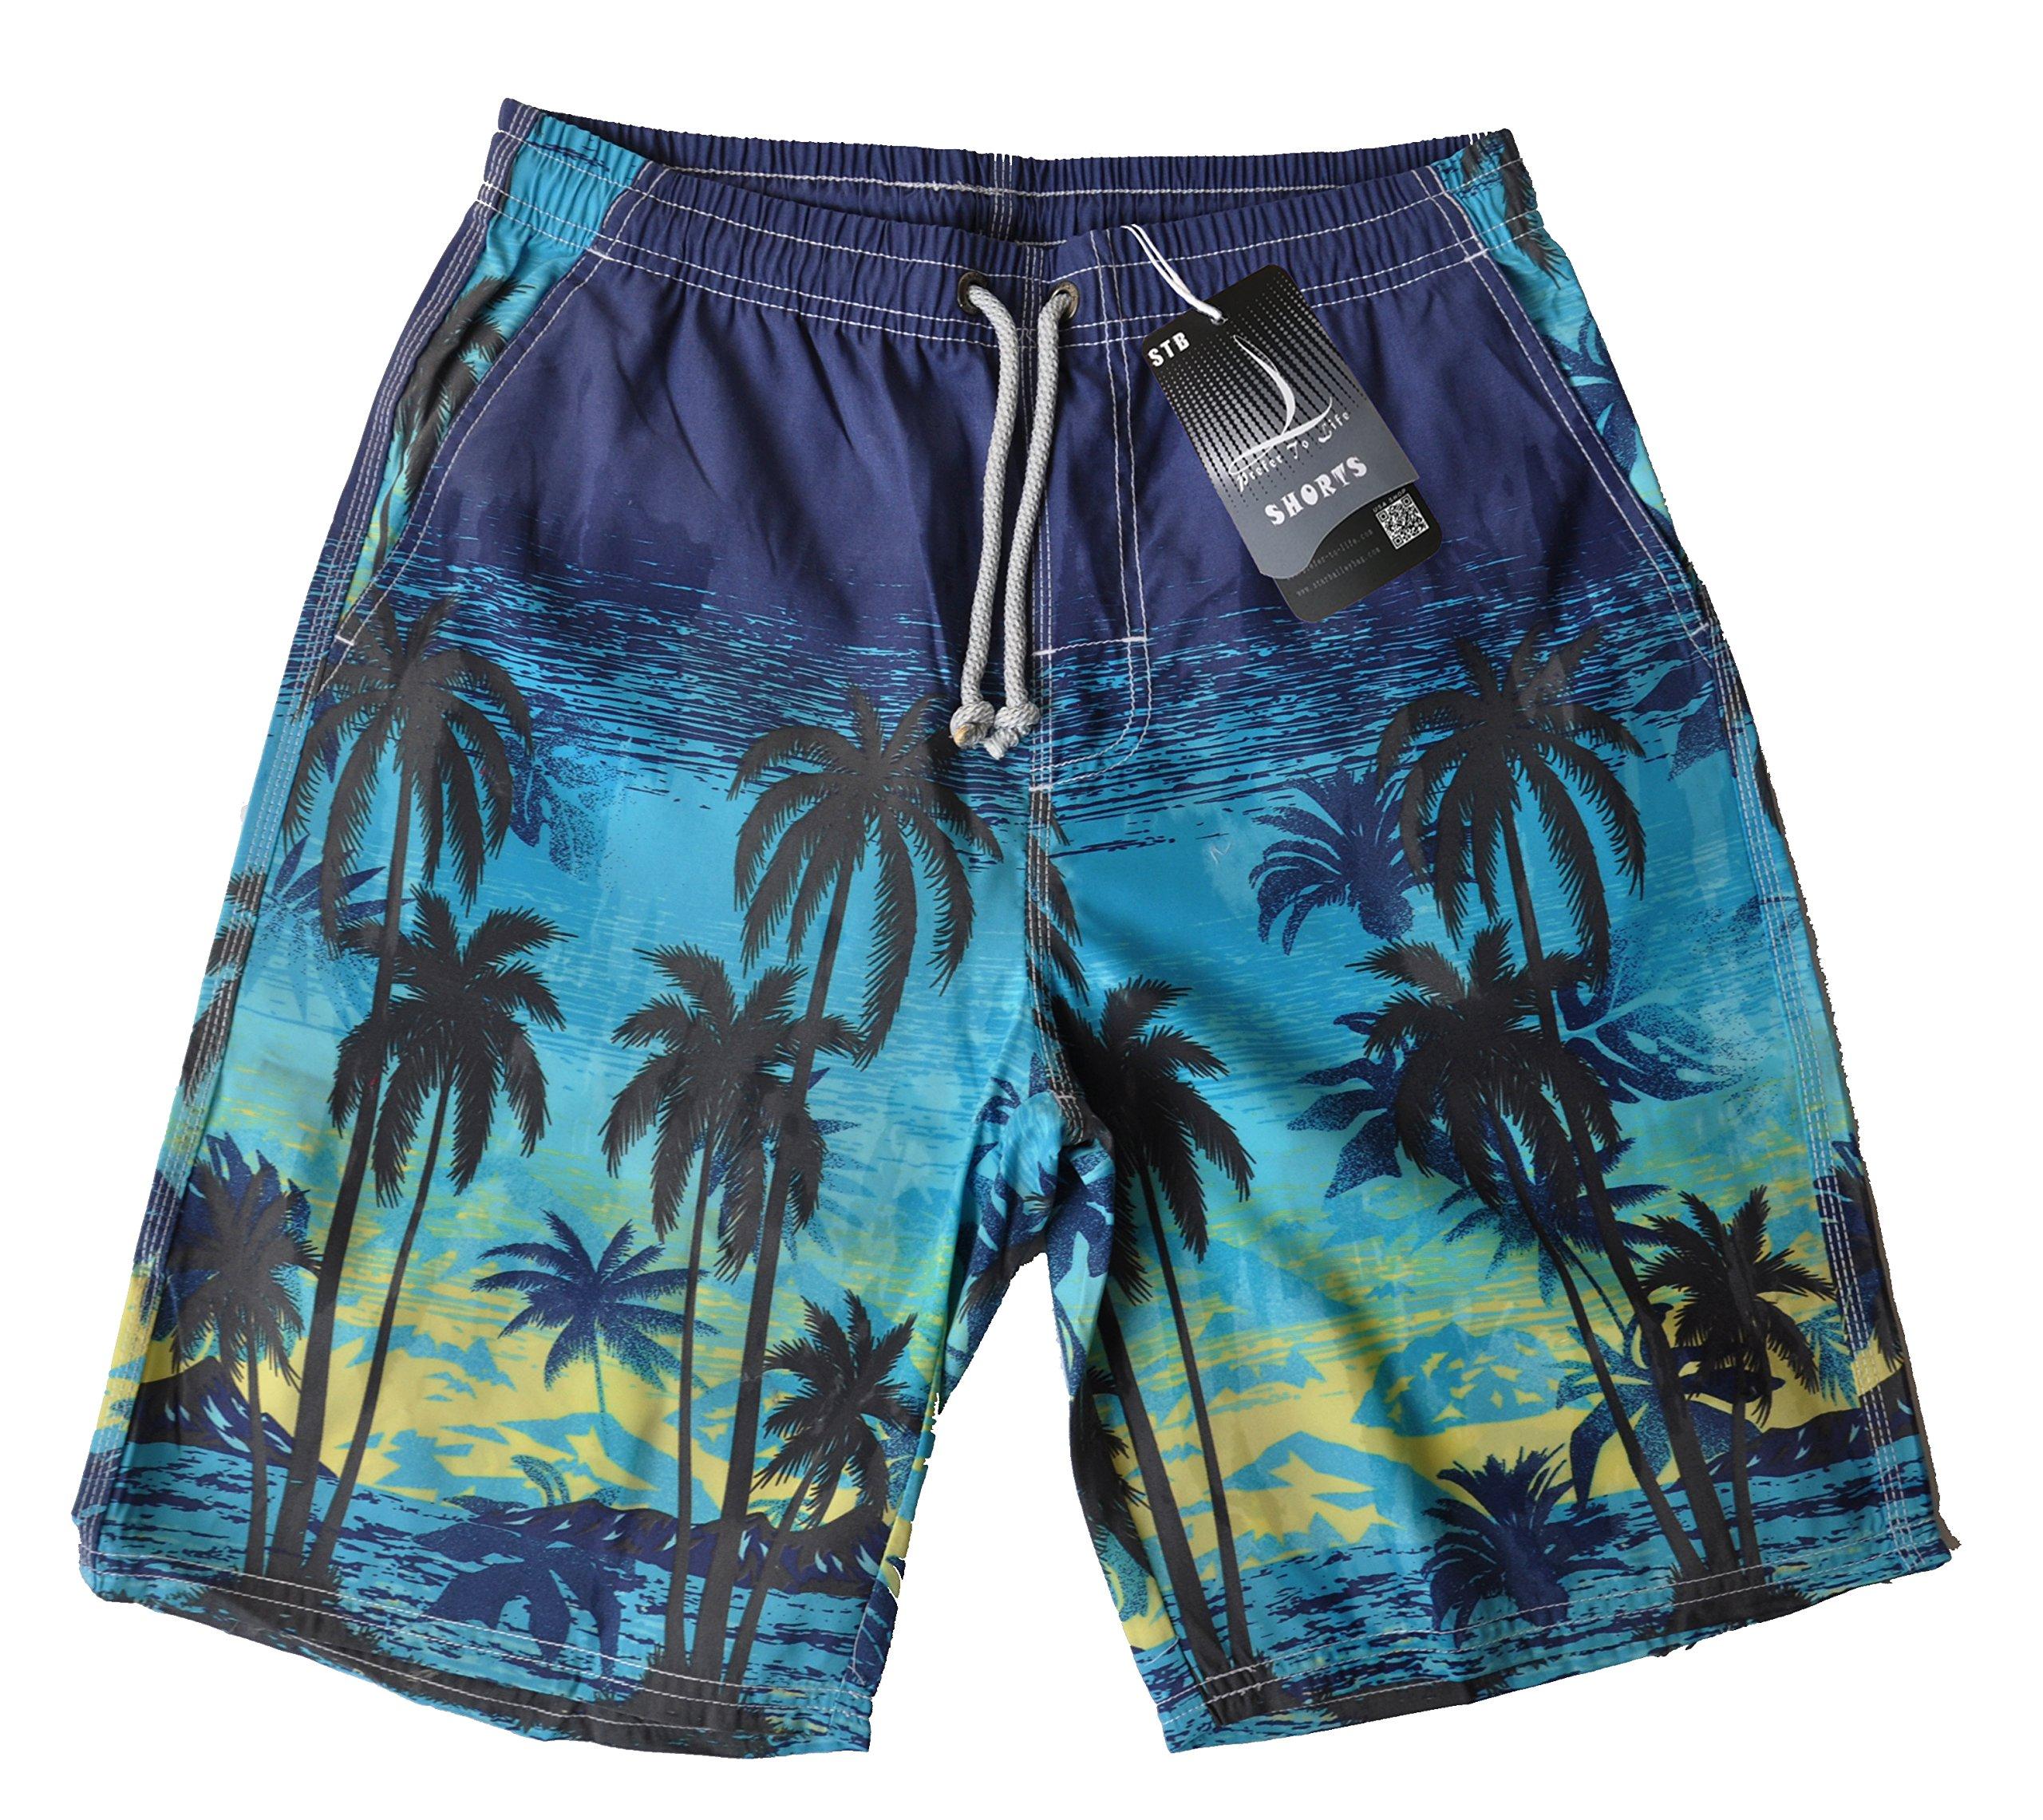 Prefer To Life Outdoor Shorts for Mens Board Shorts Outdoor Beach Pants Travel Beach Life Frist Choice Swim Truncks (XL)